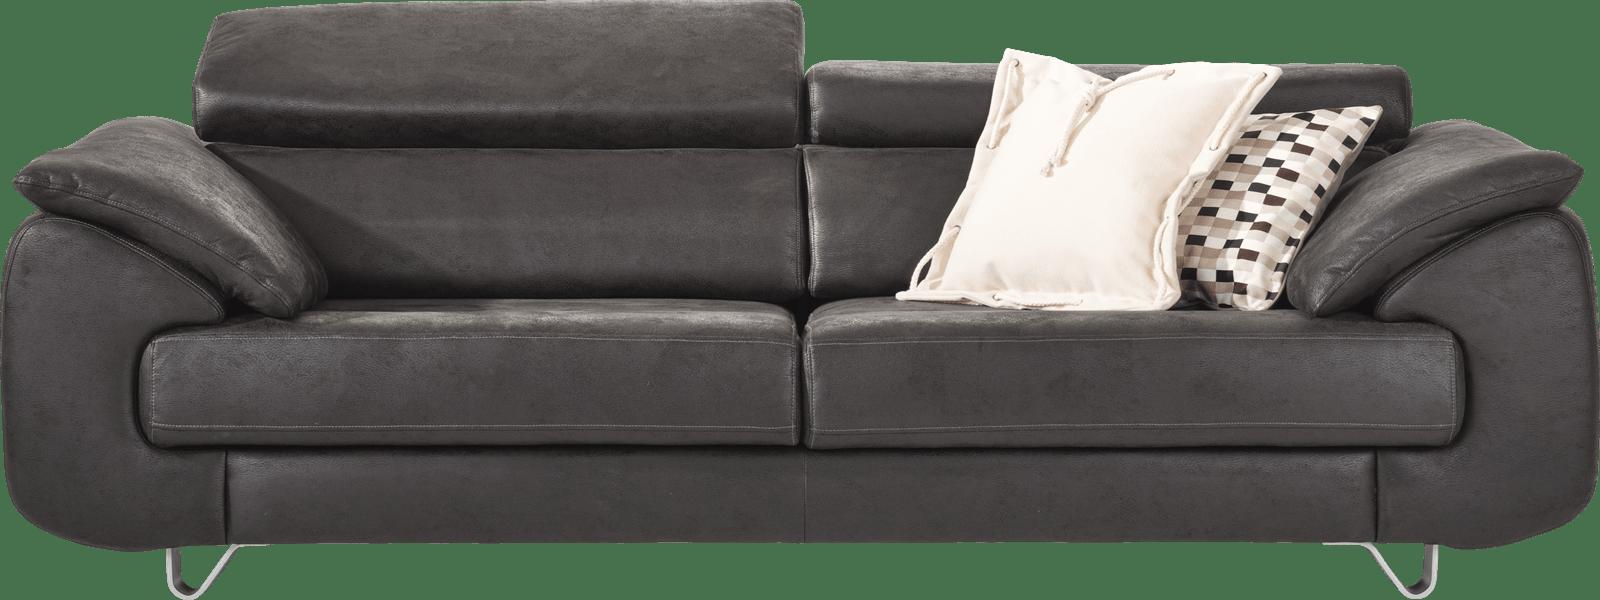 H&H - Havanna - Moderne - 3-place assise fixe